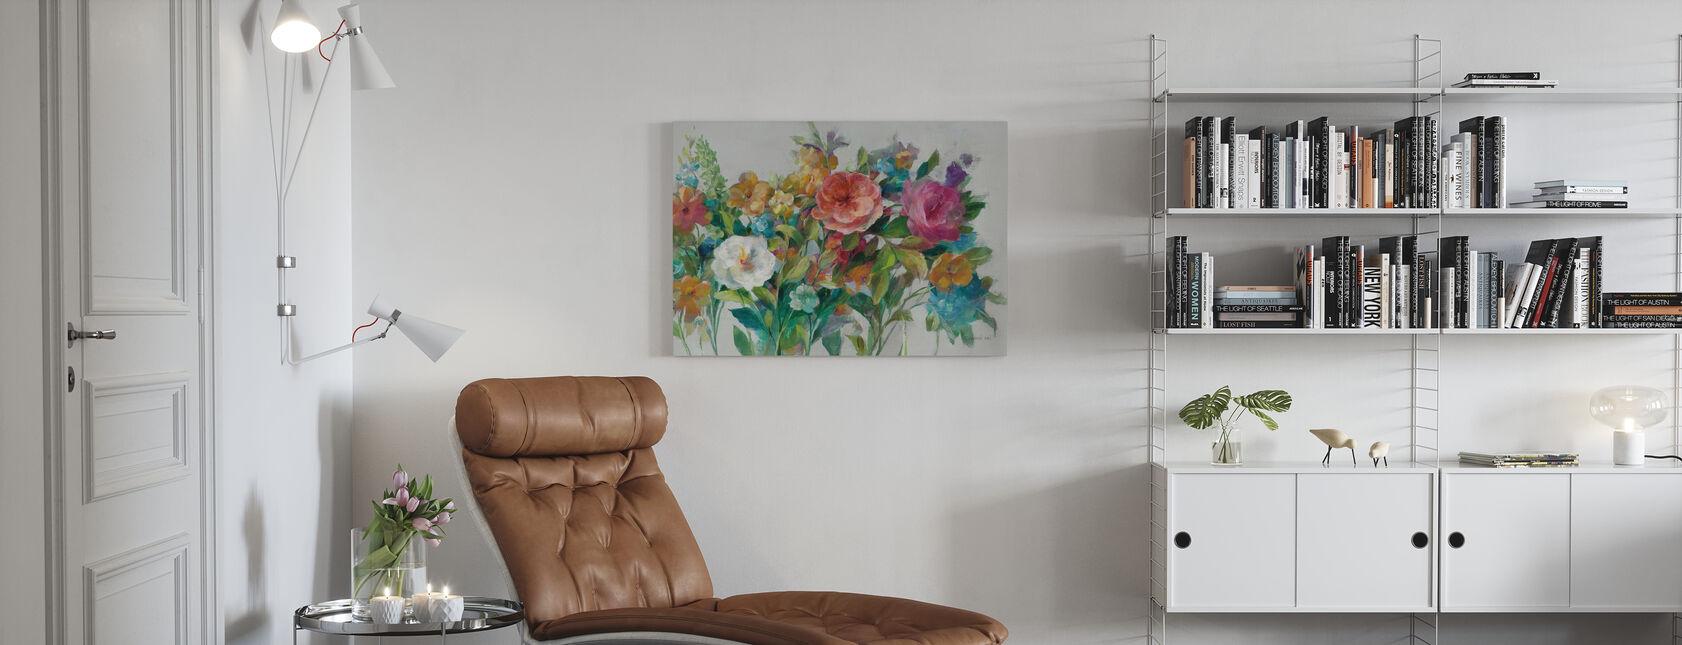 Land Blommorna Neutral - Canvastavla - Vardagsrum